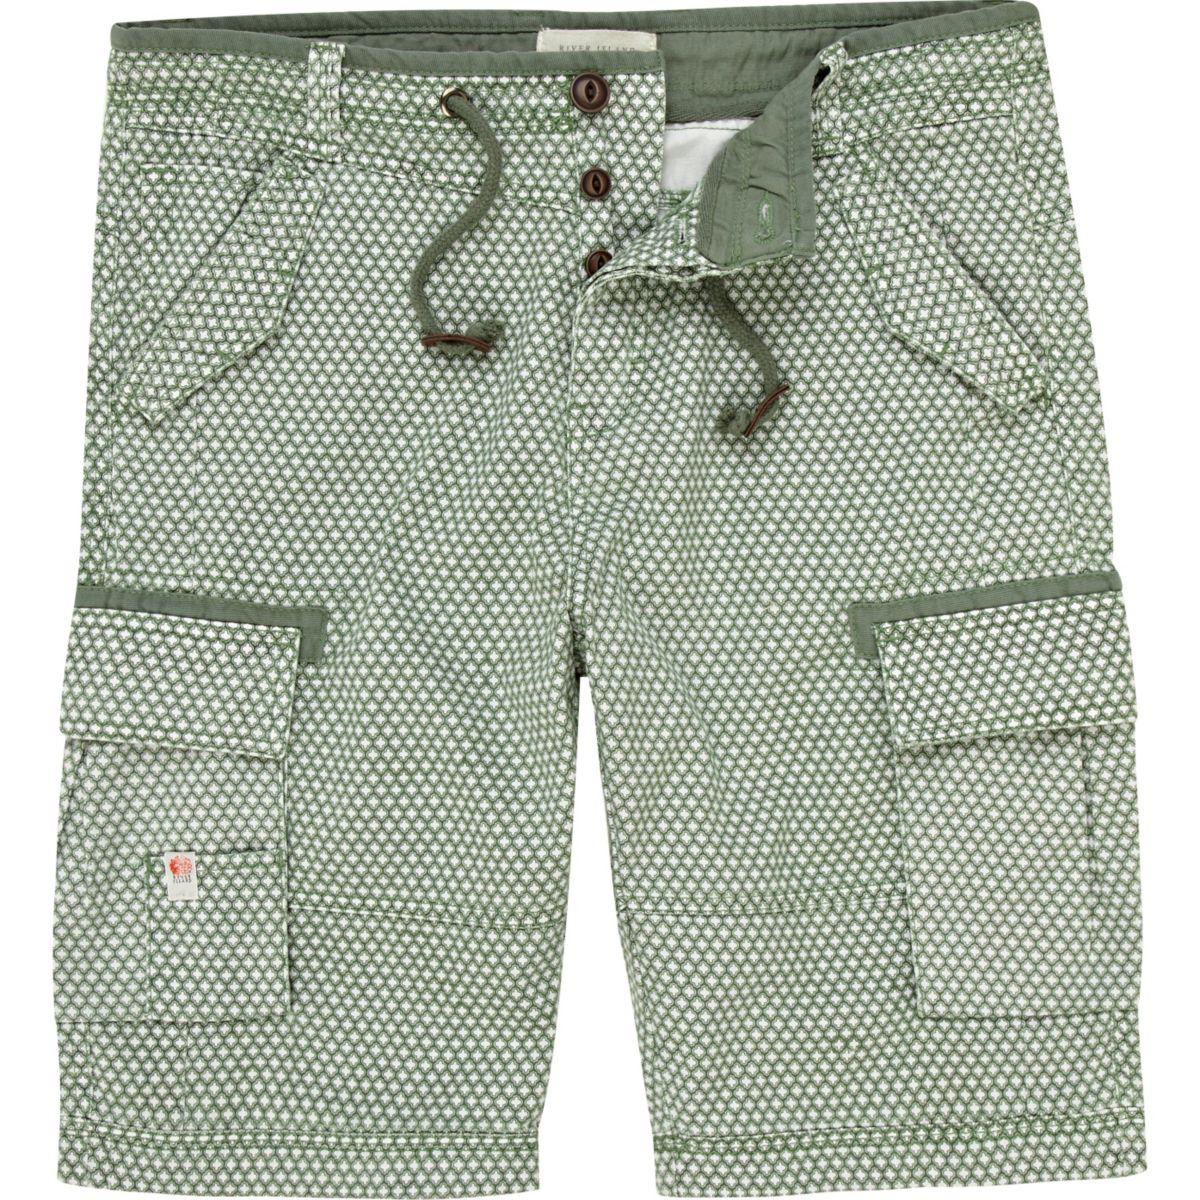 Green pattern bermuda shorts